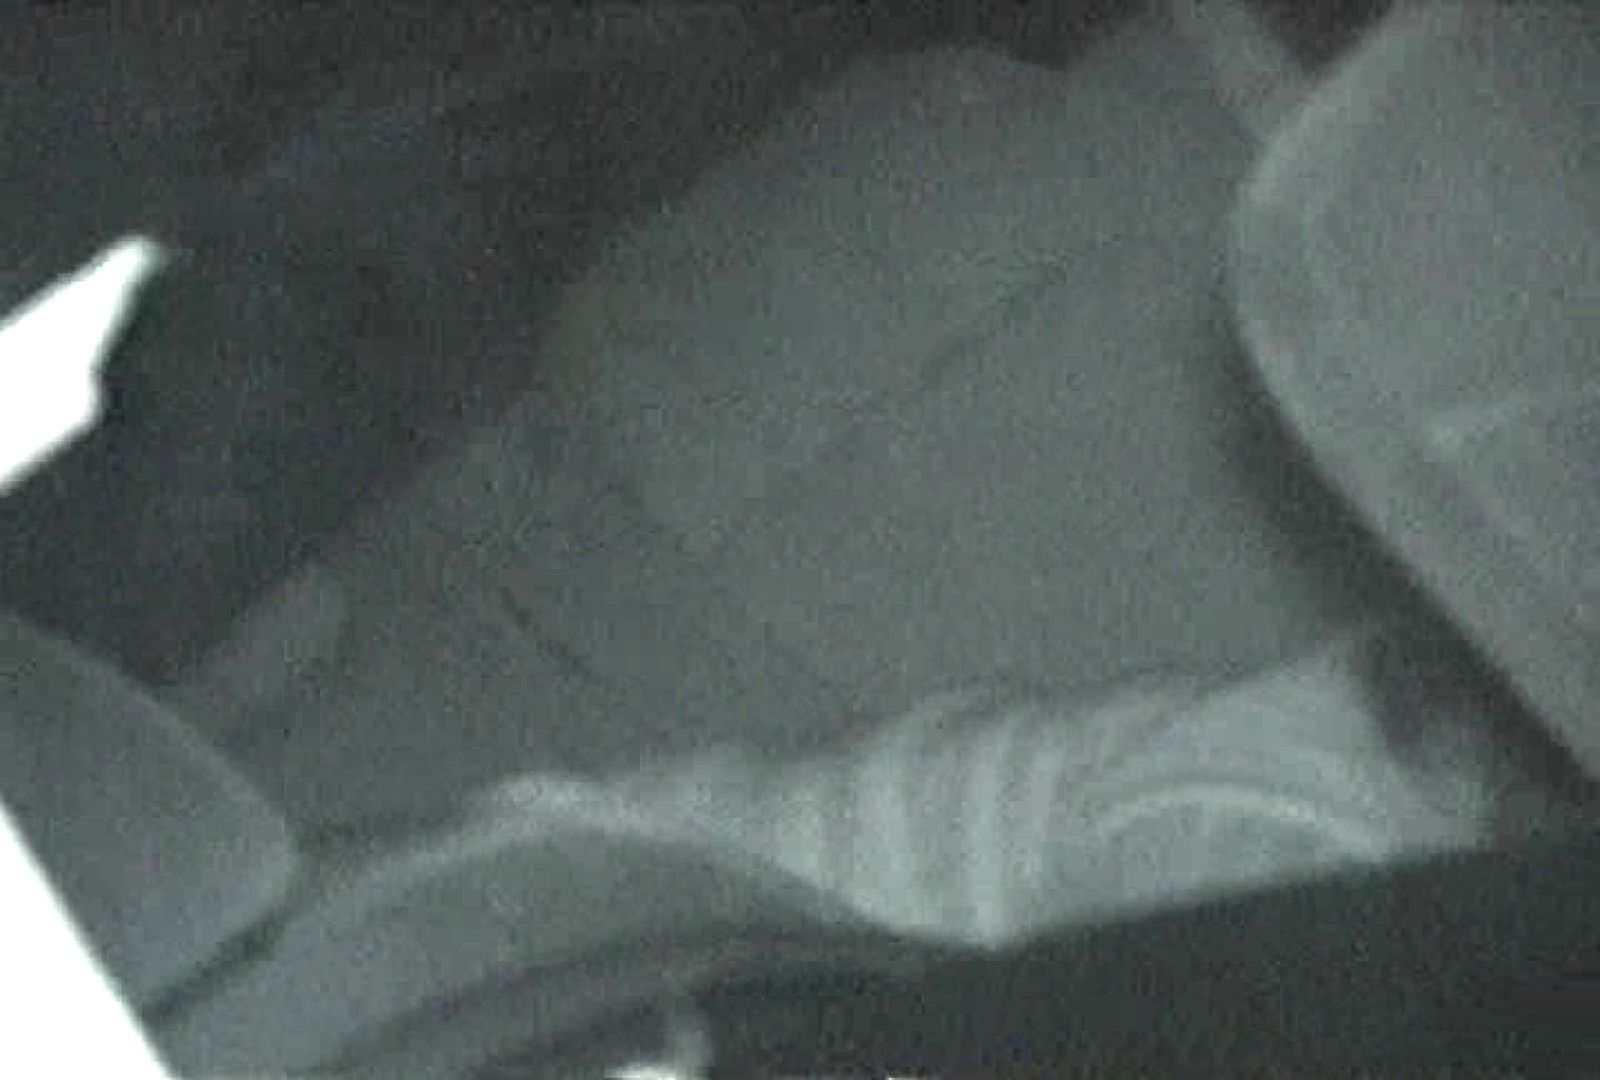 充血監督の深夜の運動会Vol.88 細身 戯れ無修正画像 73画像 39